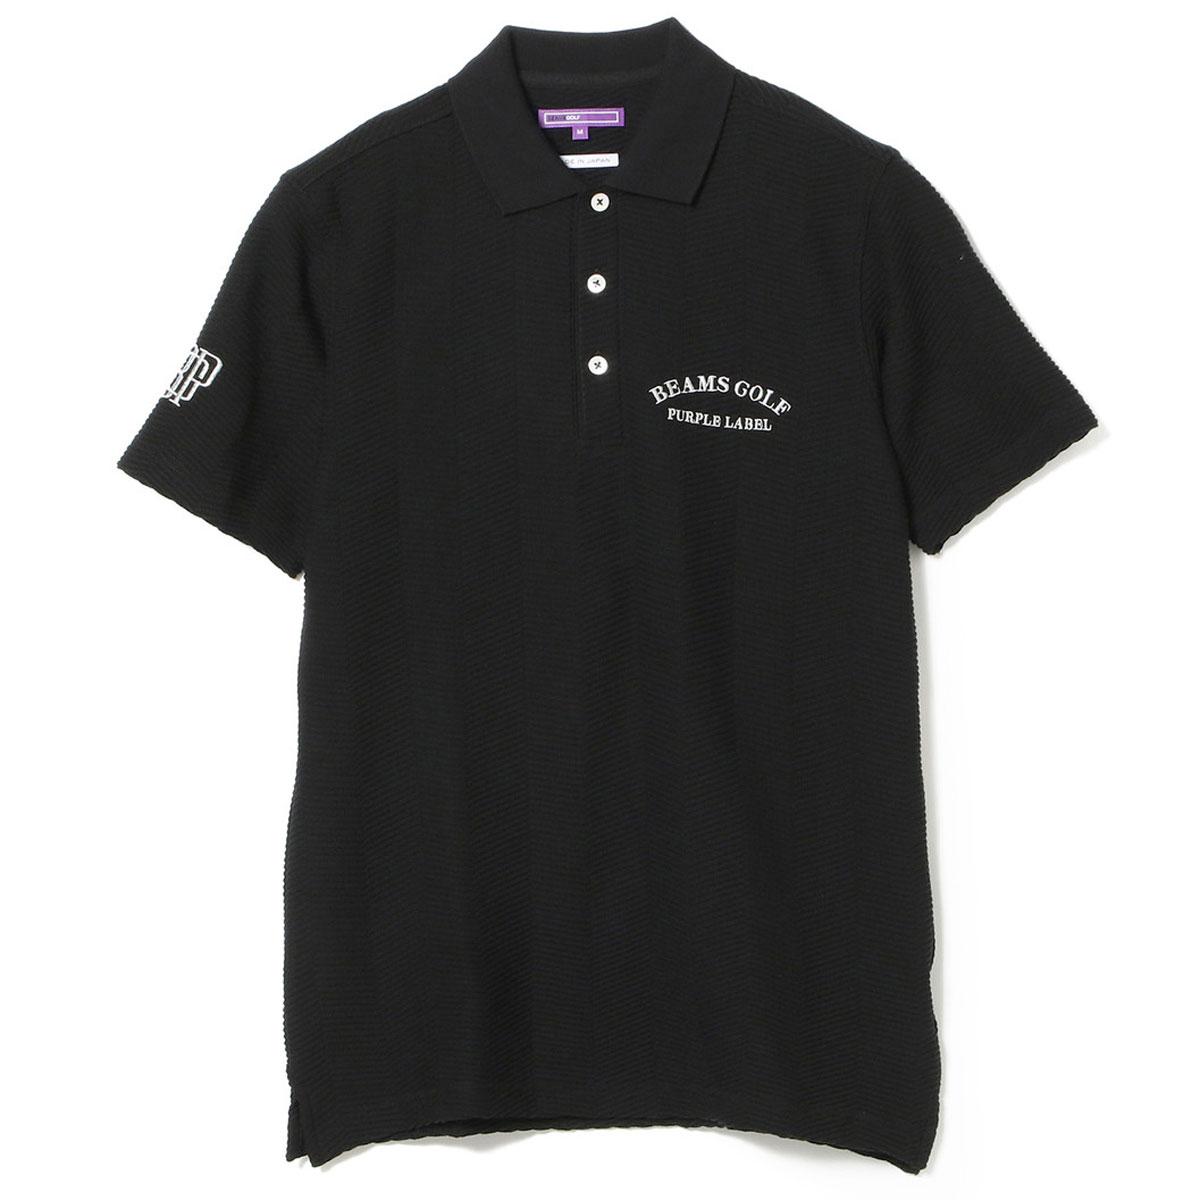 BEAMS GOLF PURPLE LABEL リンクス へリンボーン ポロシャツ